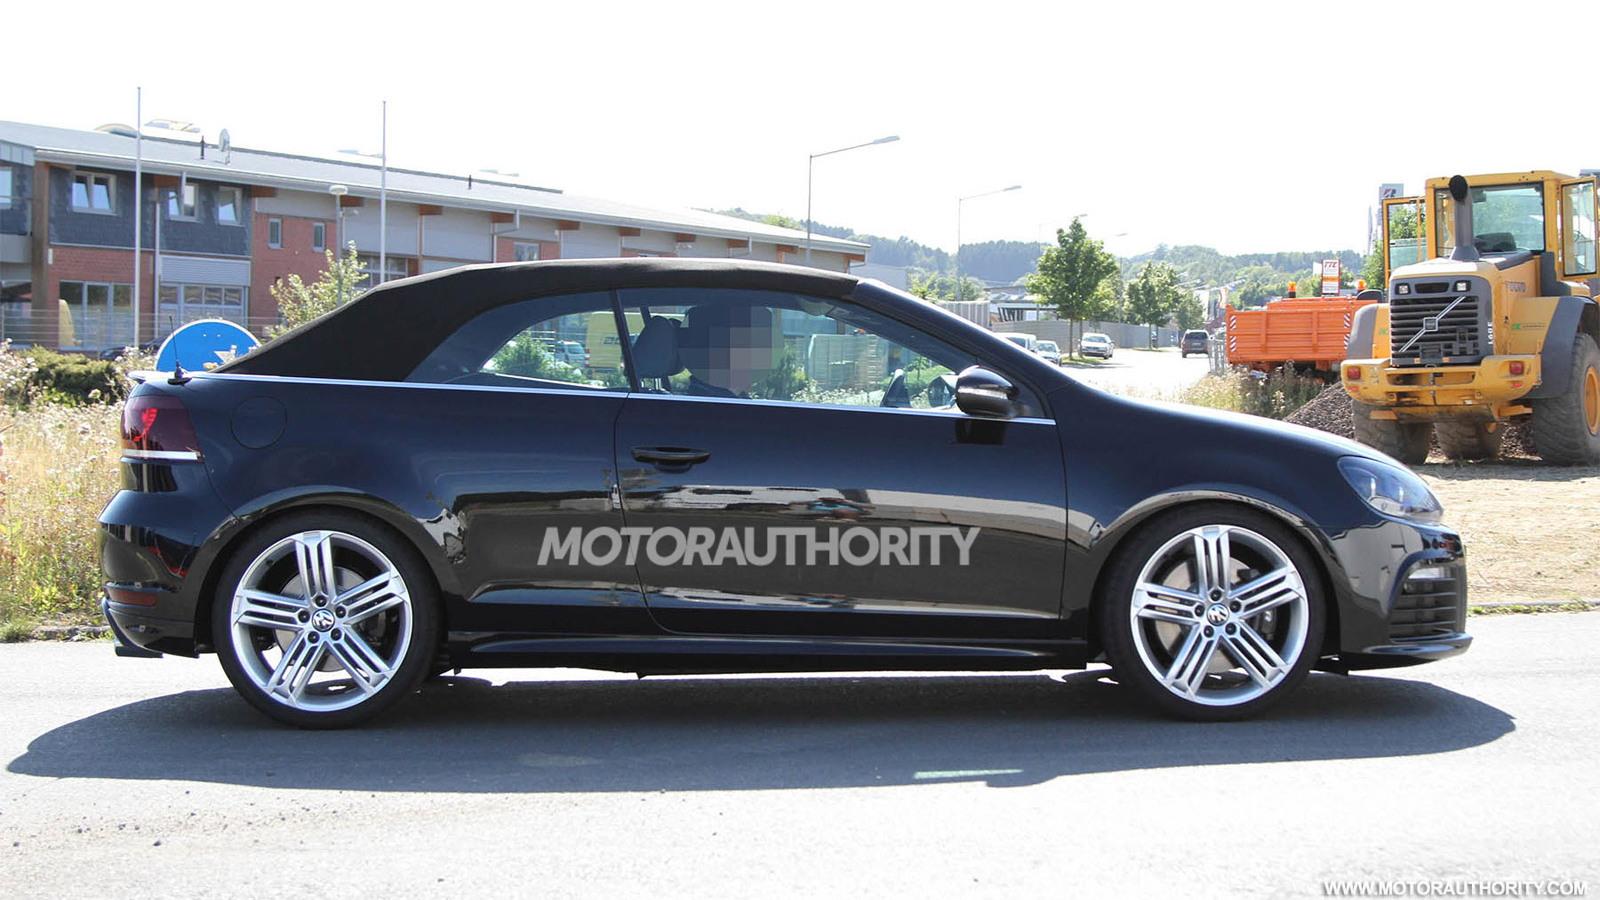 2013 Volkswagen Golf R Cabriolet spy shots